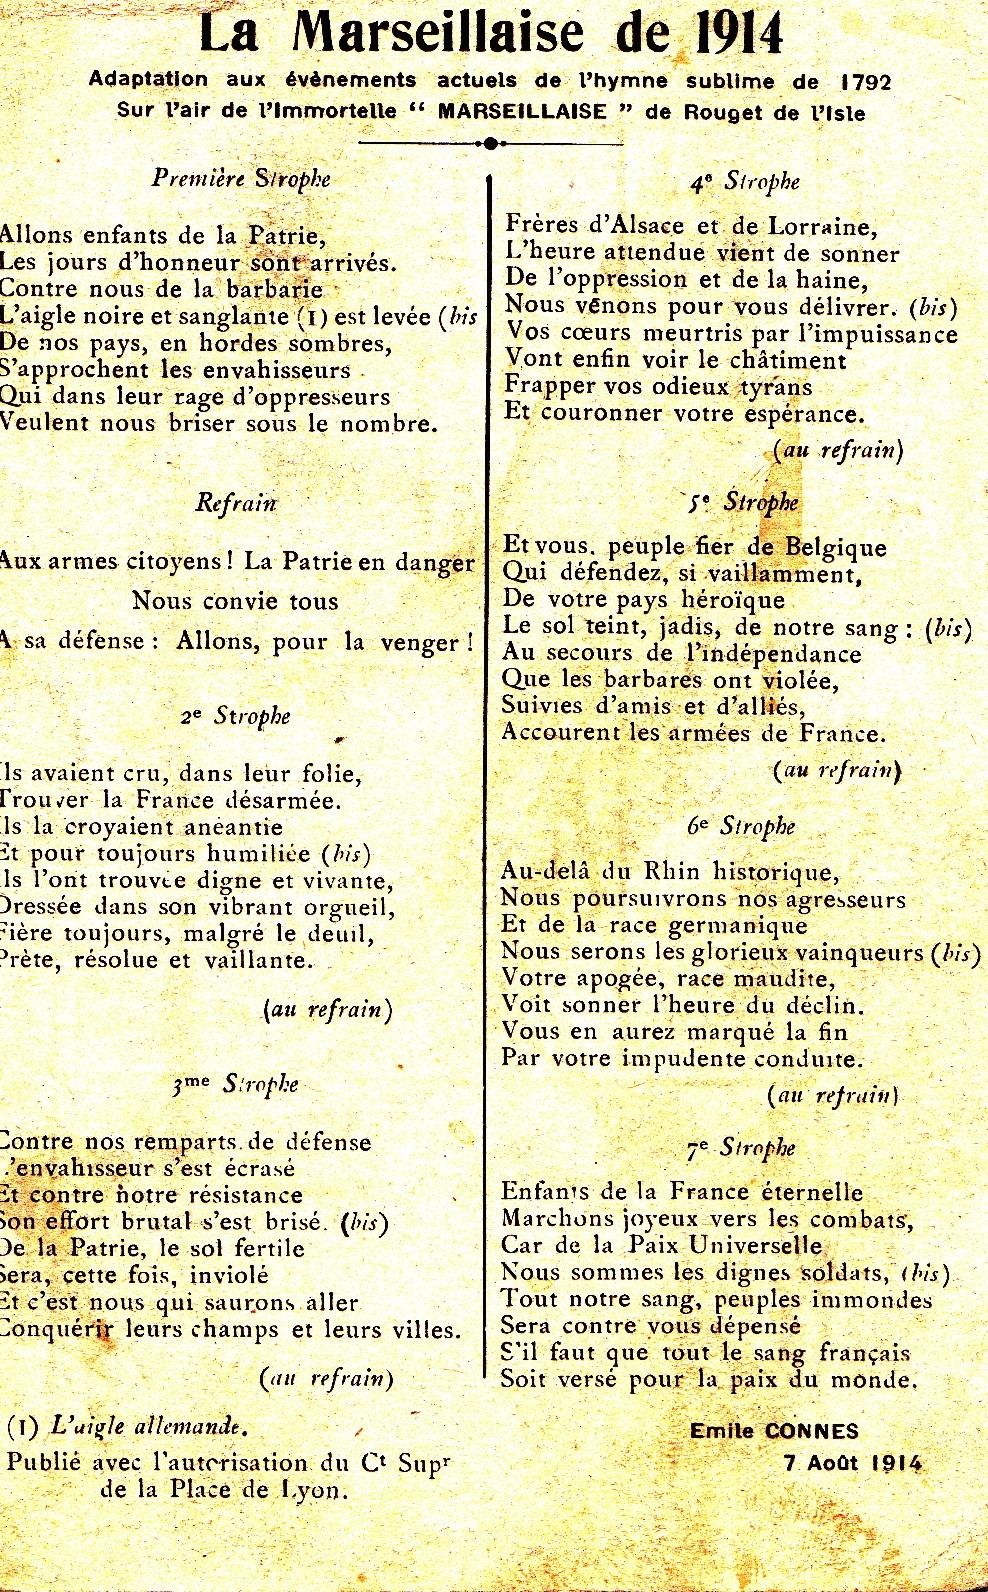 100 ans apr u00e8s  une marseillaise lyonnaise  u2013 olivier longeon